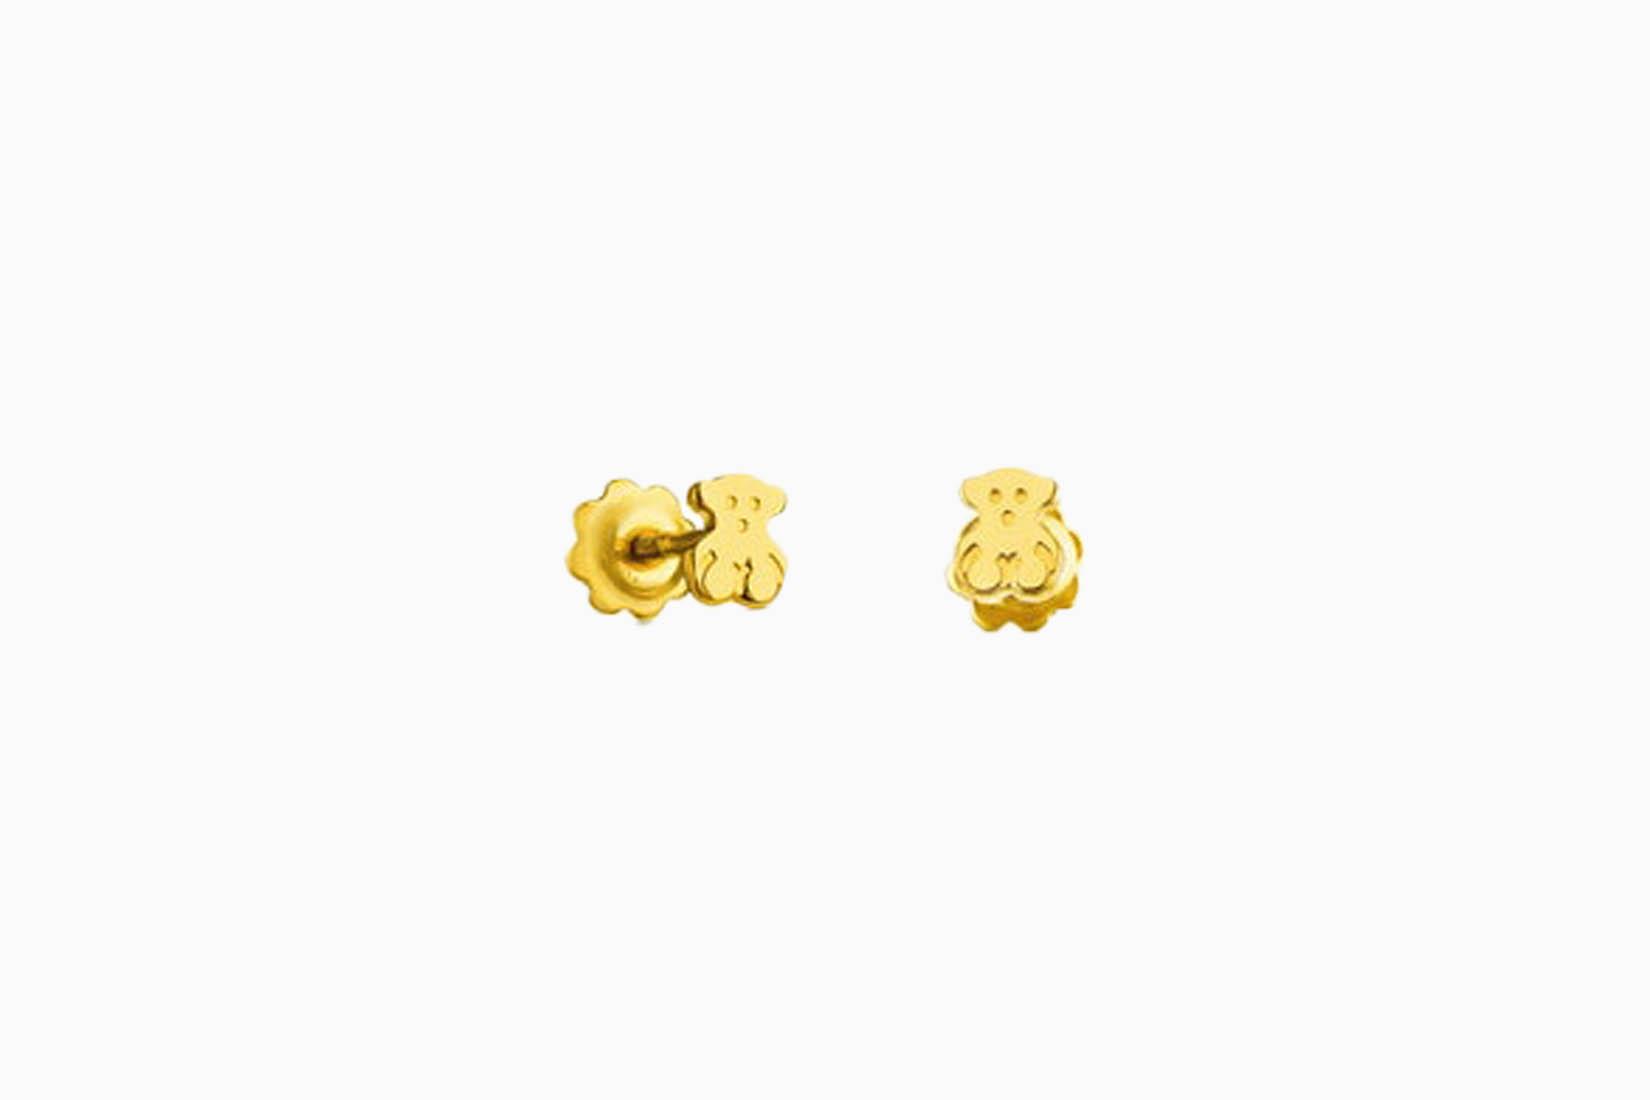 best gift kids tous earrings review Luxe Digital